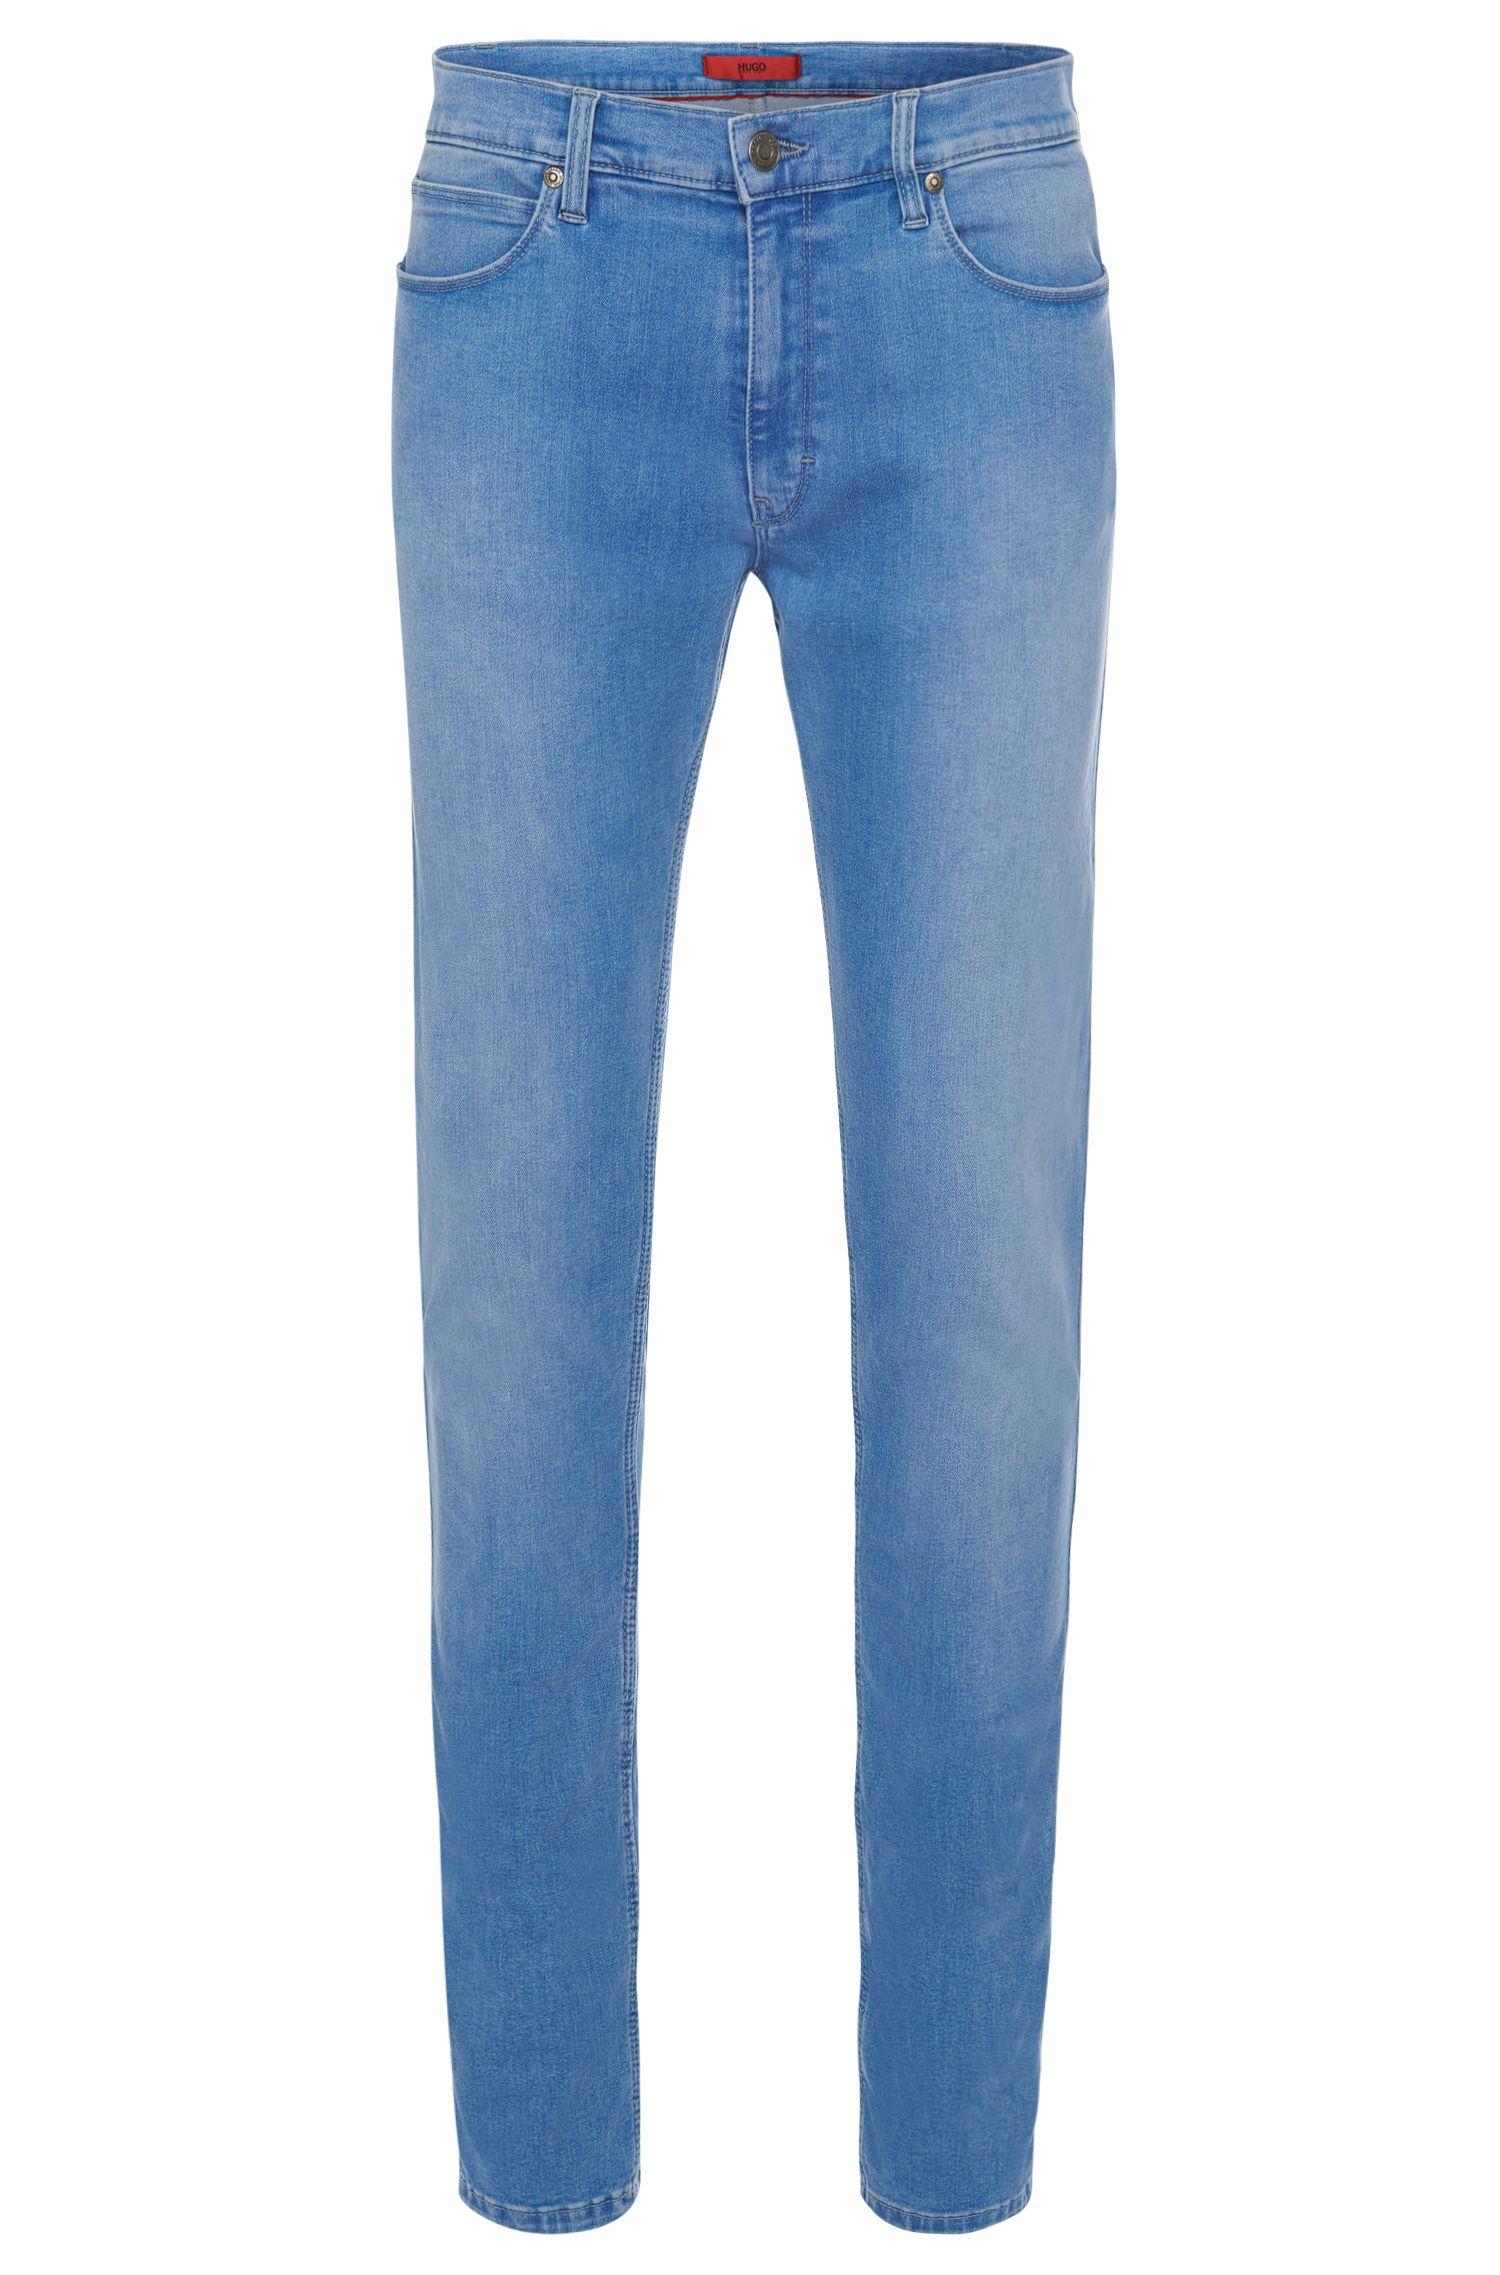 'Hugo 734' | Slim Fit, 11.75 oz Stretch Cotton Blend Jeans